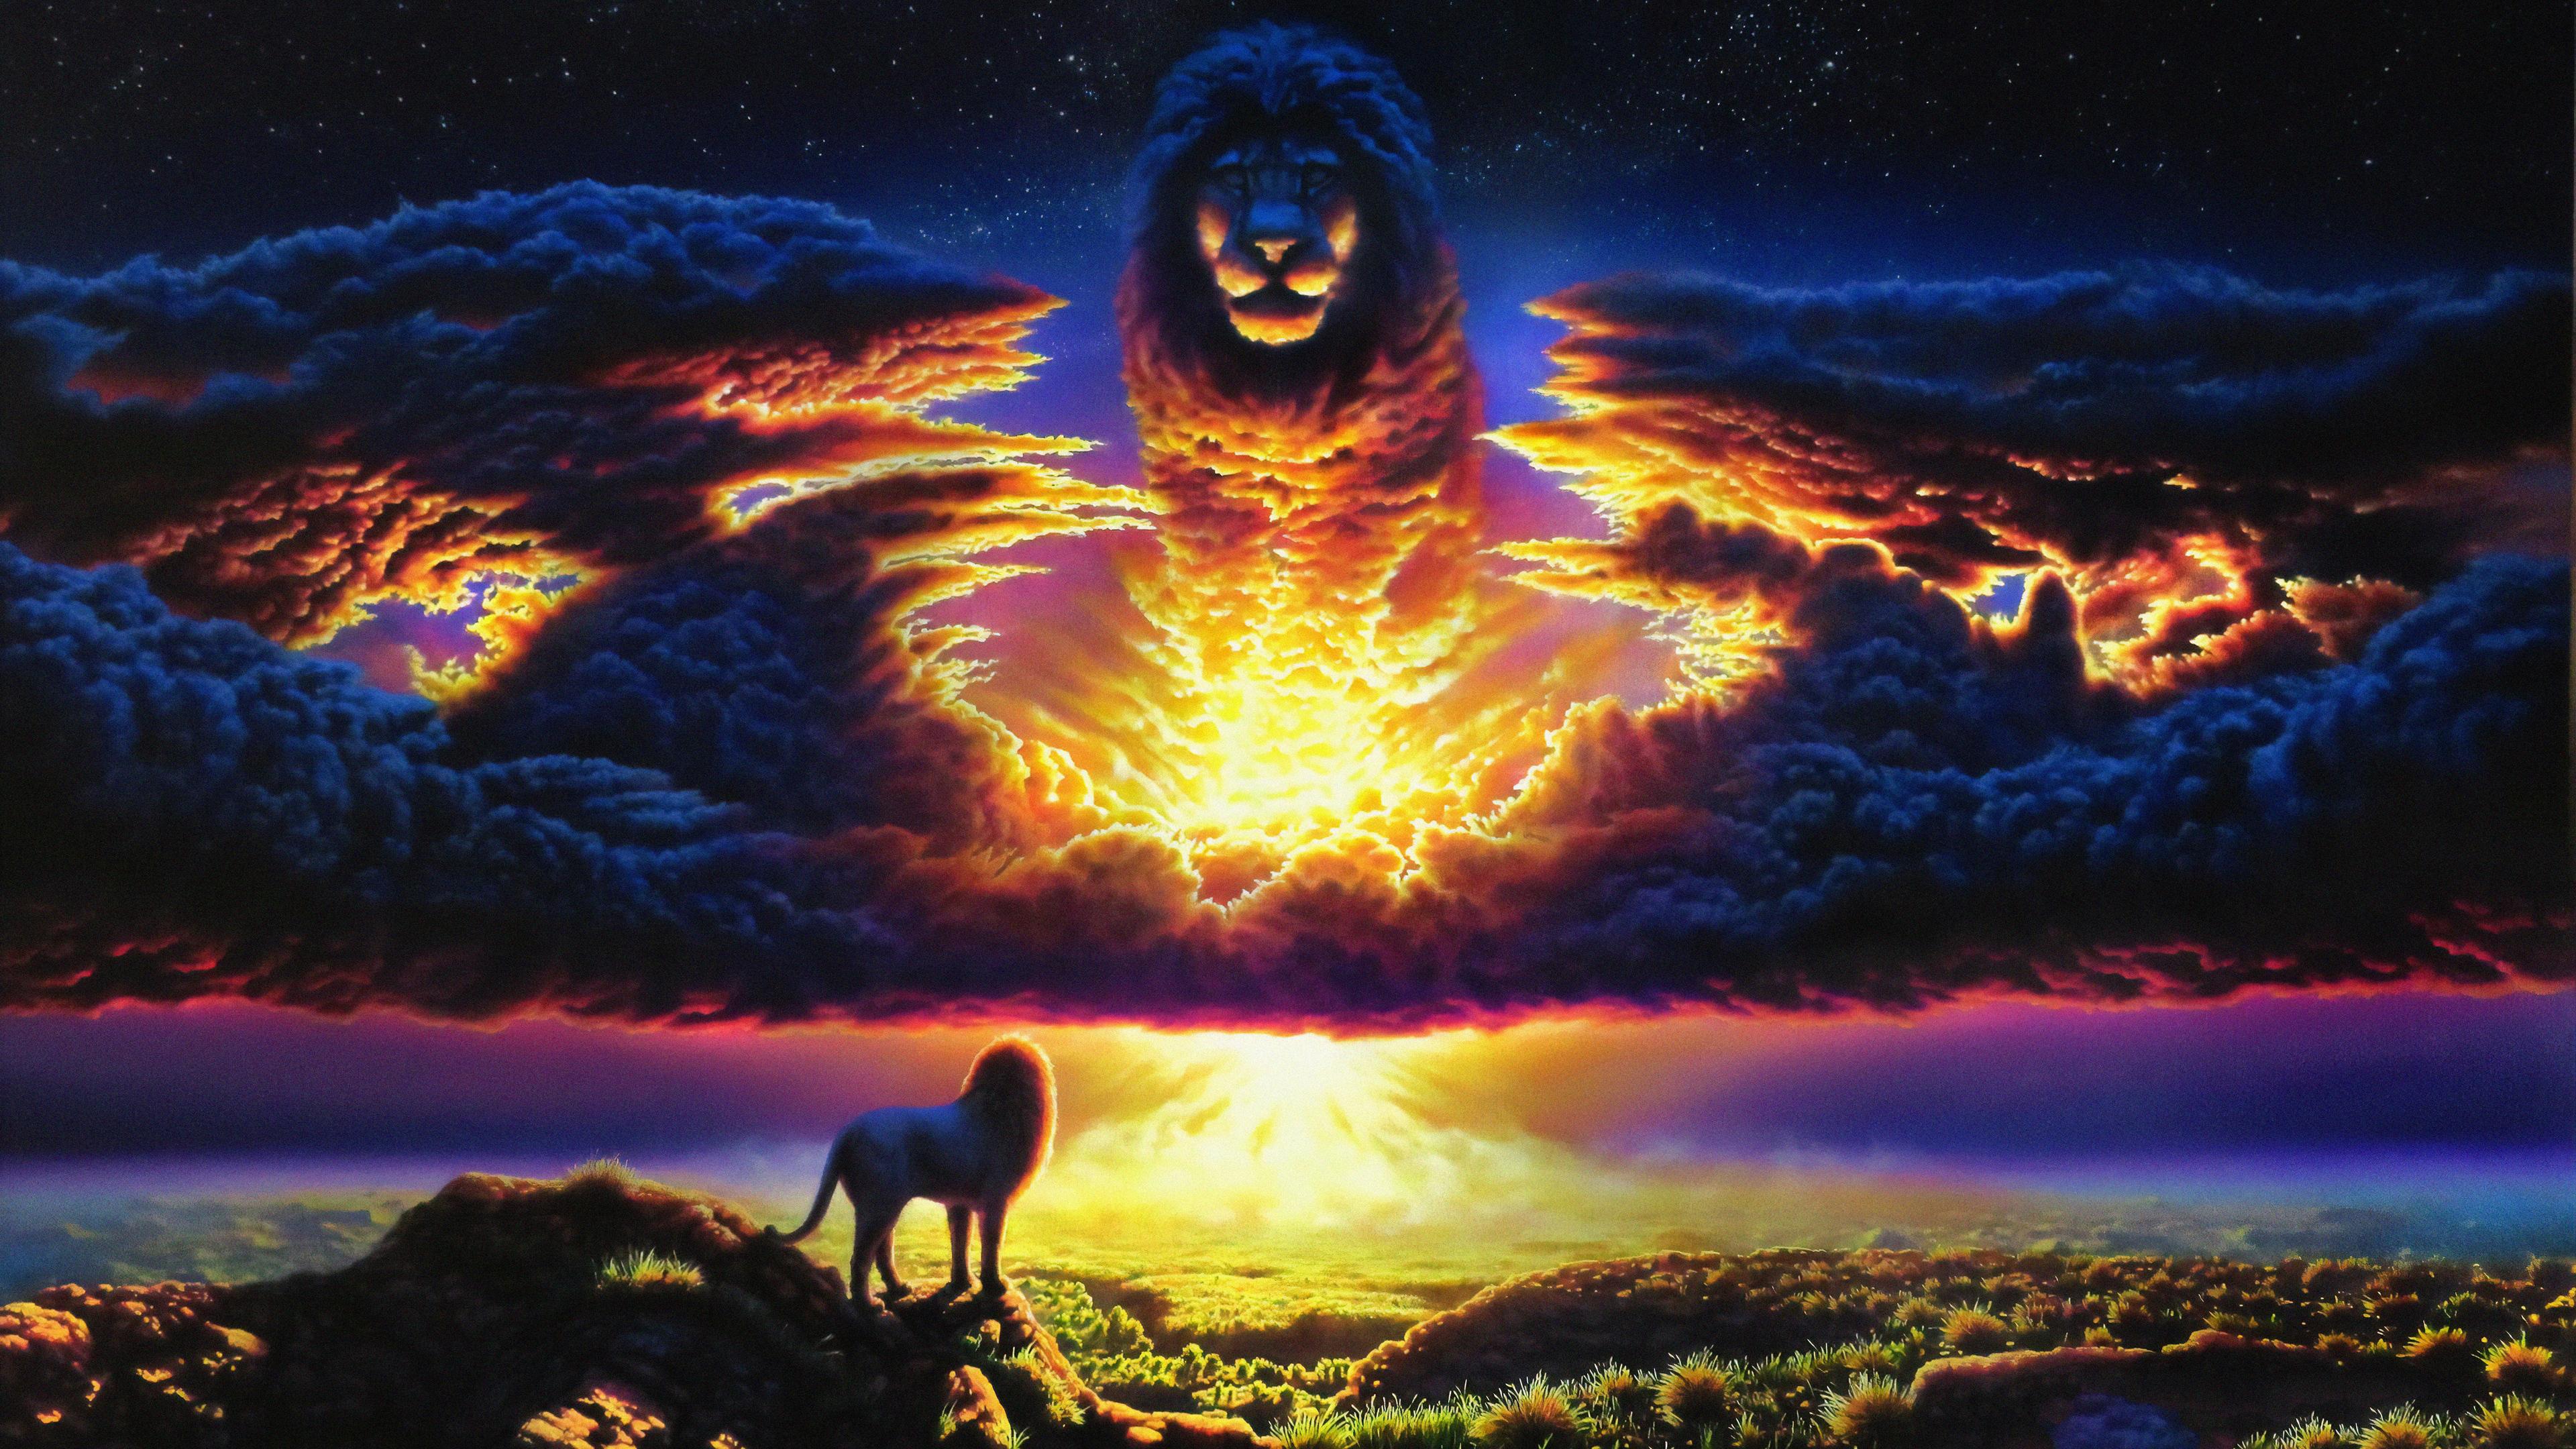 the lion king 2019 art 1563220854 - The Lion King 2019 Art - the lion king wallpapers, hd-wallpapers, artwork wallpapers, artstation wallpapers, 4k-wallpapers